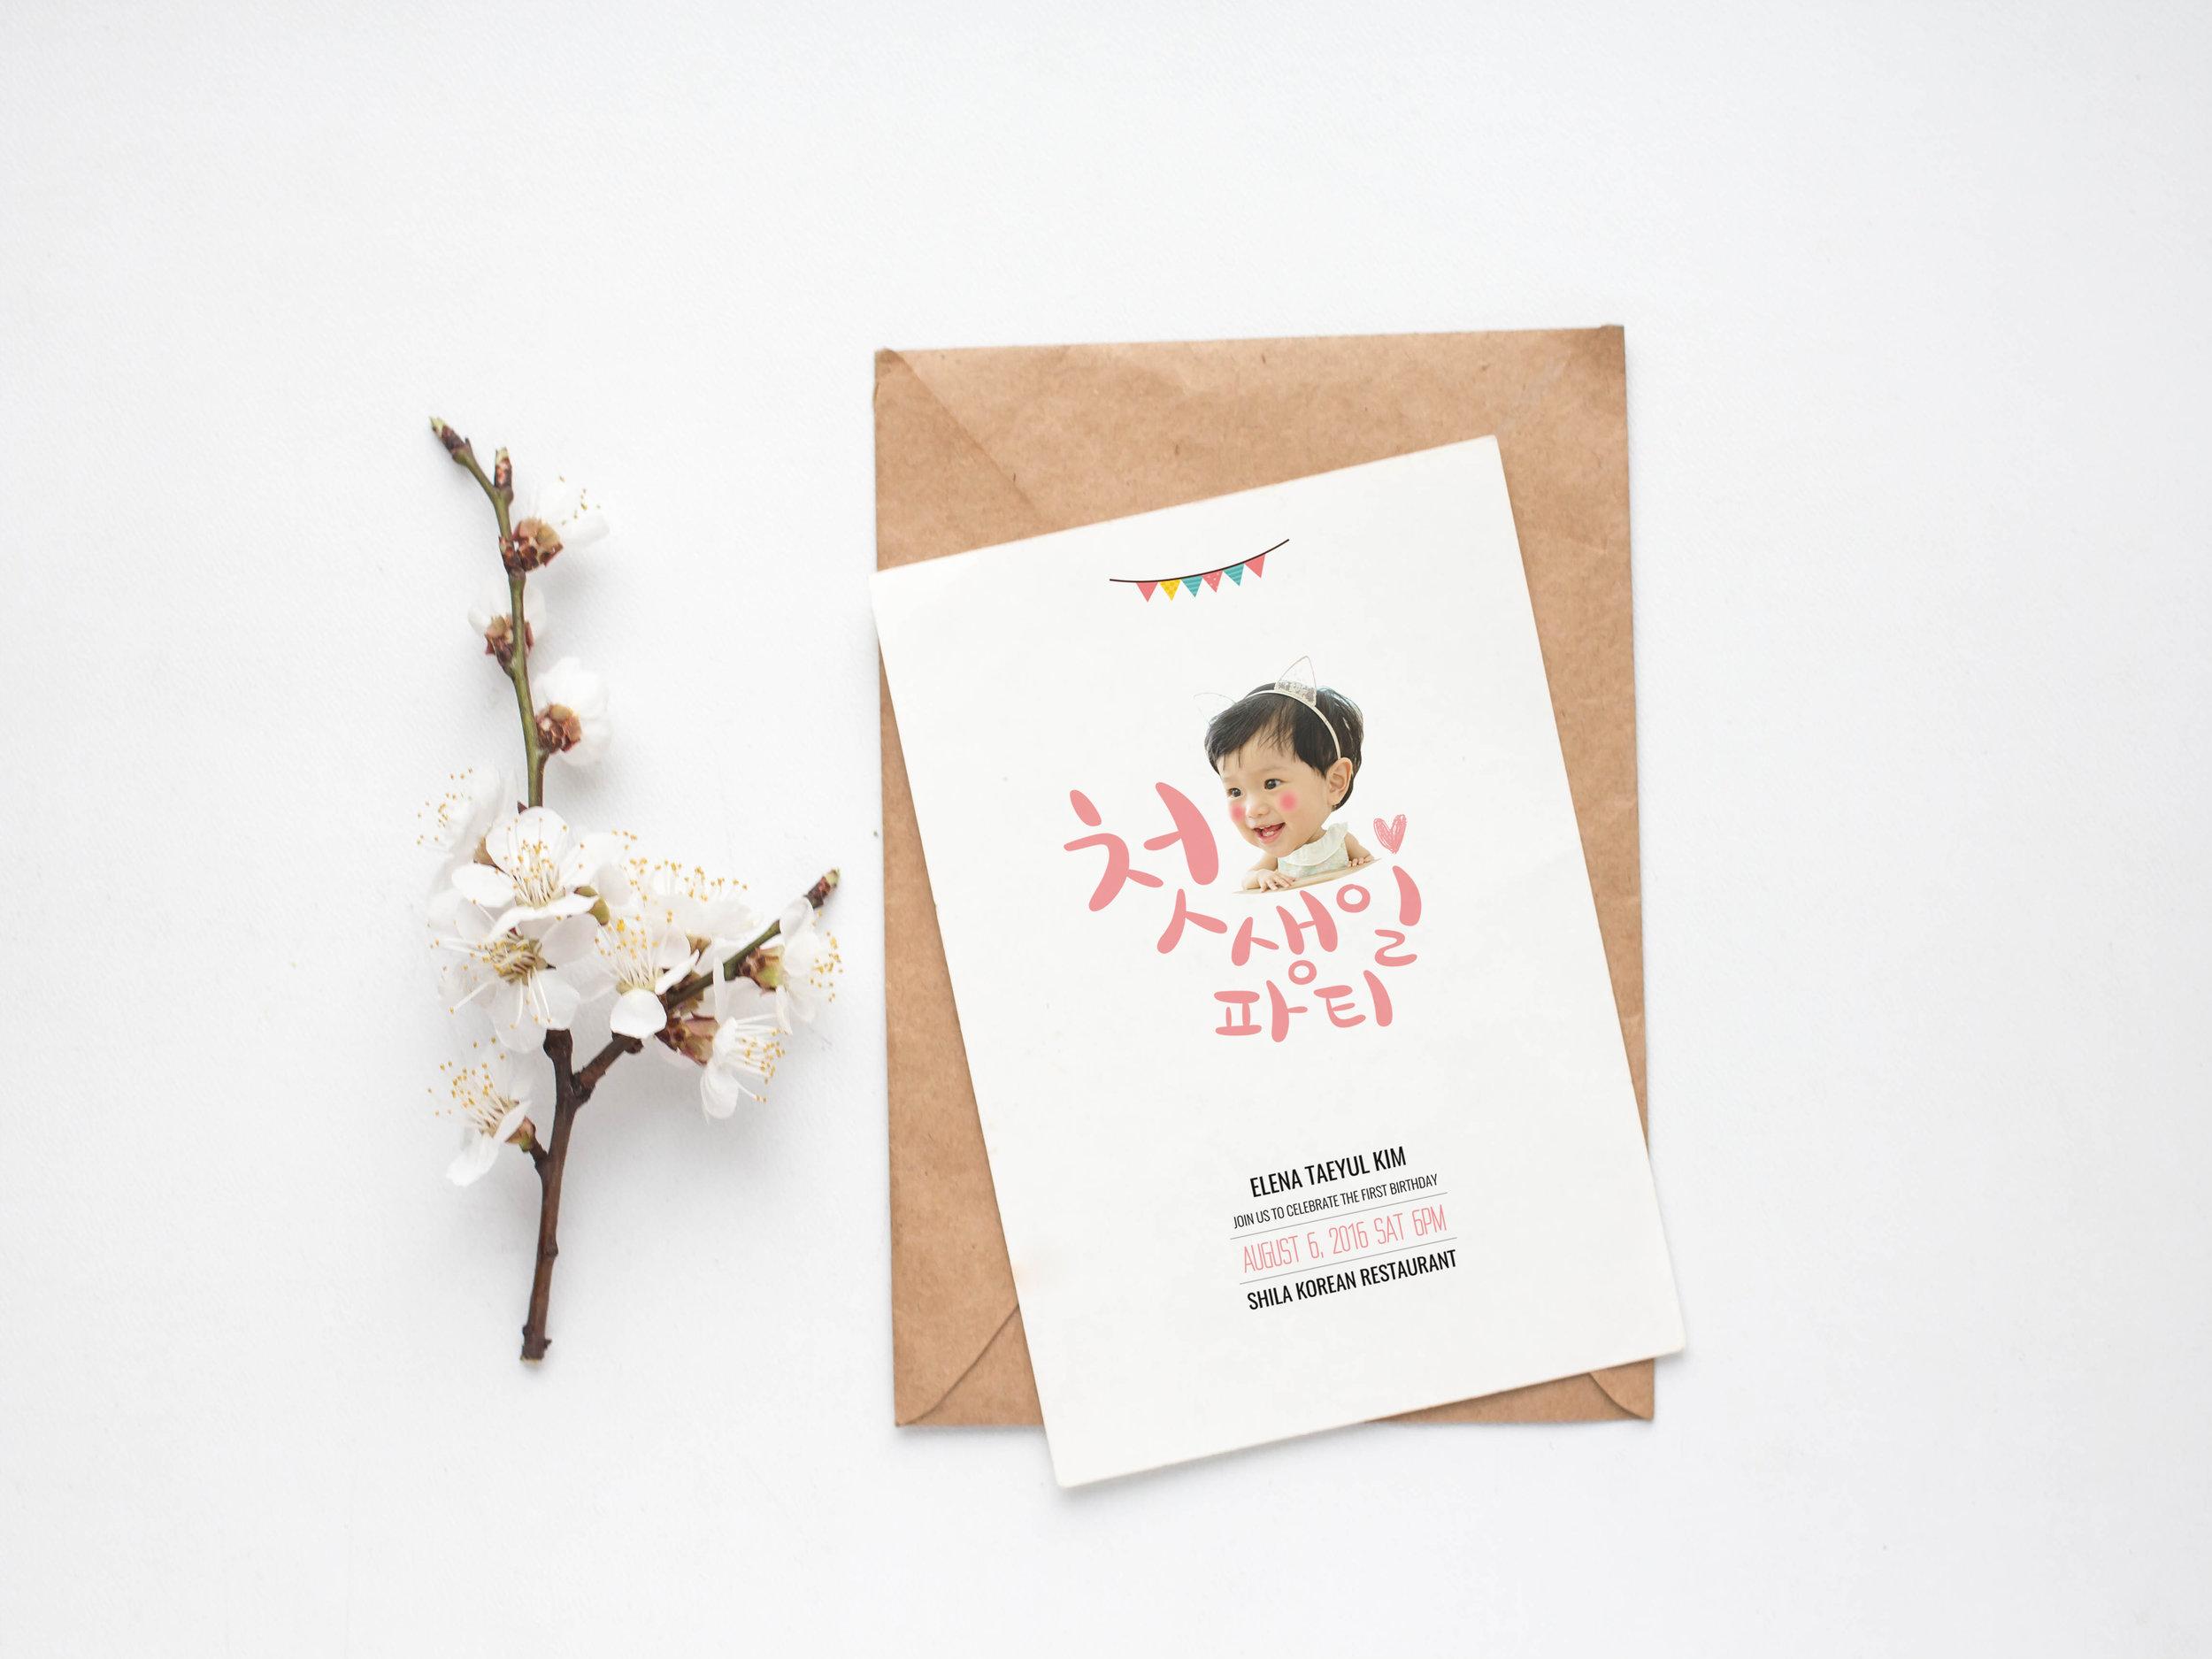 Free-Minimalistic-Invitation-Mockup-PSD-2018.jpg